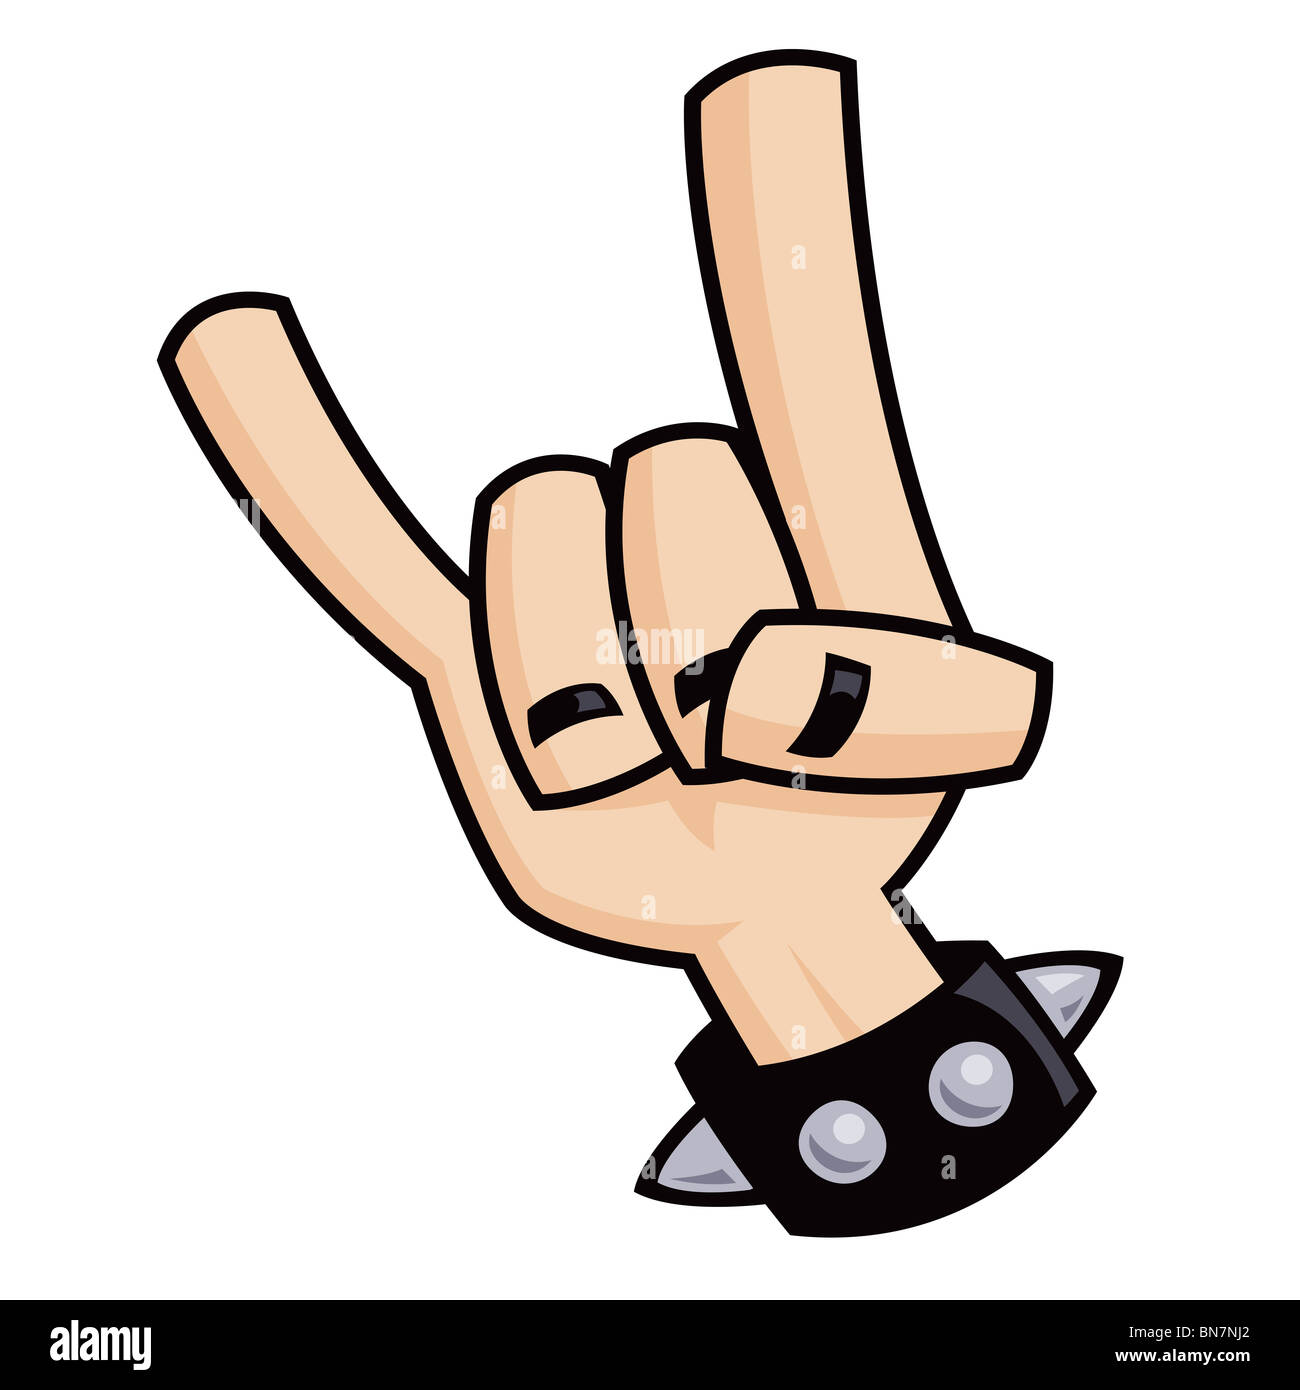 Heavy metal rock and roll devil horns hand sign with a black heavy metal rock and roll devil horns hand sign with a black leather studded bracelet buycottarizona